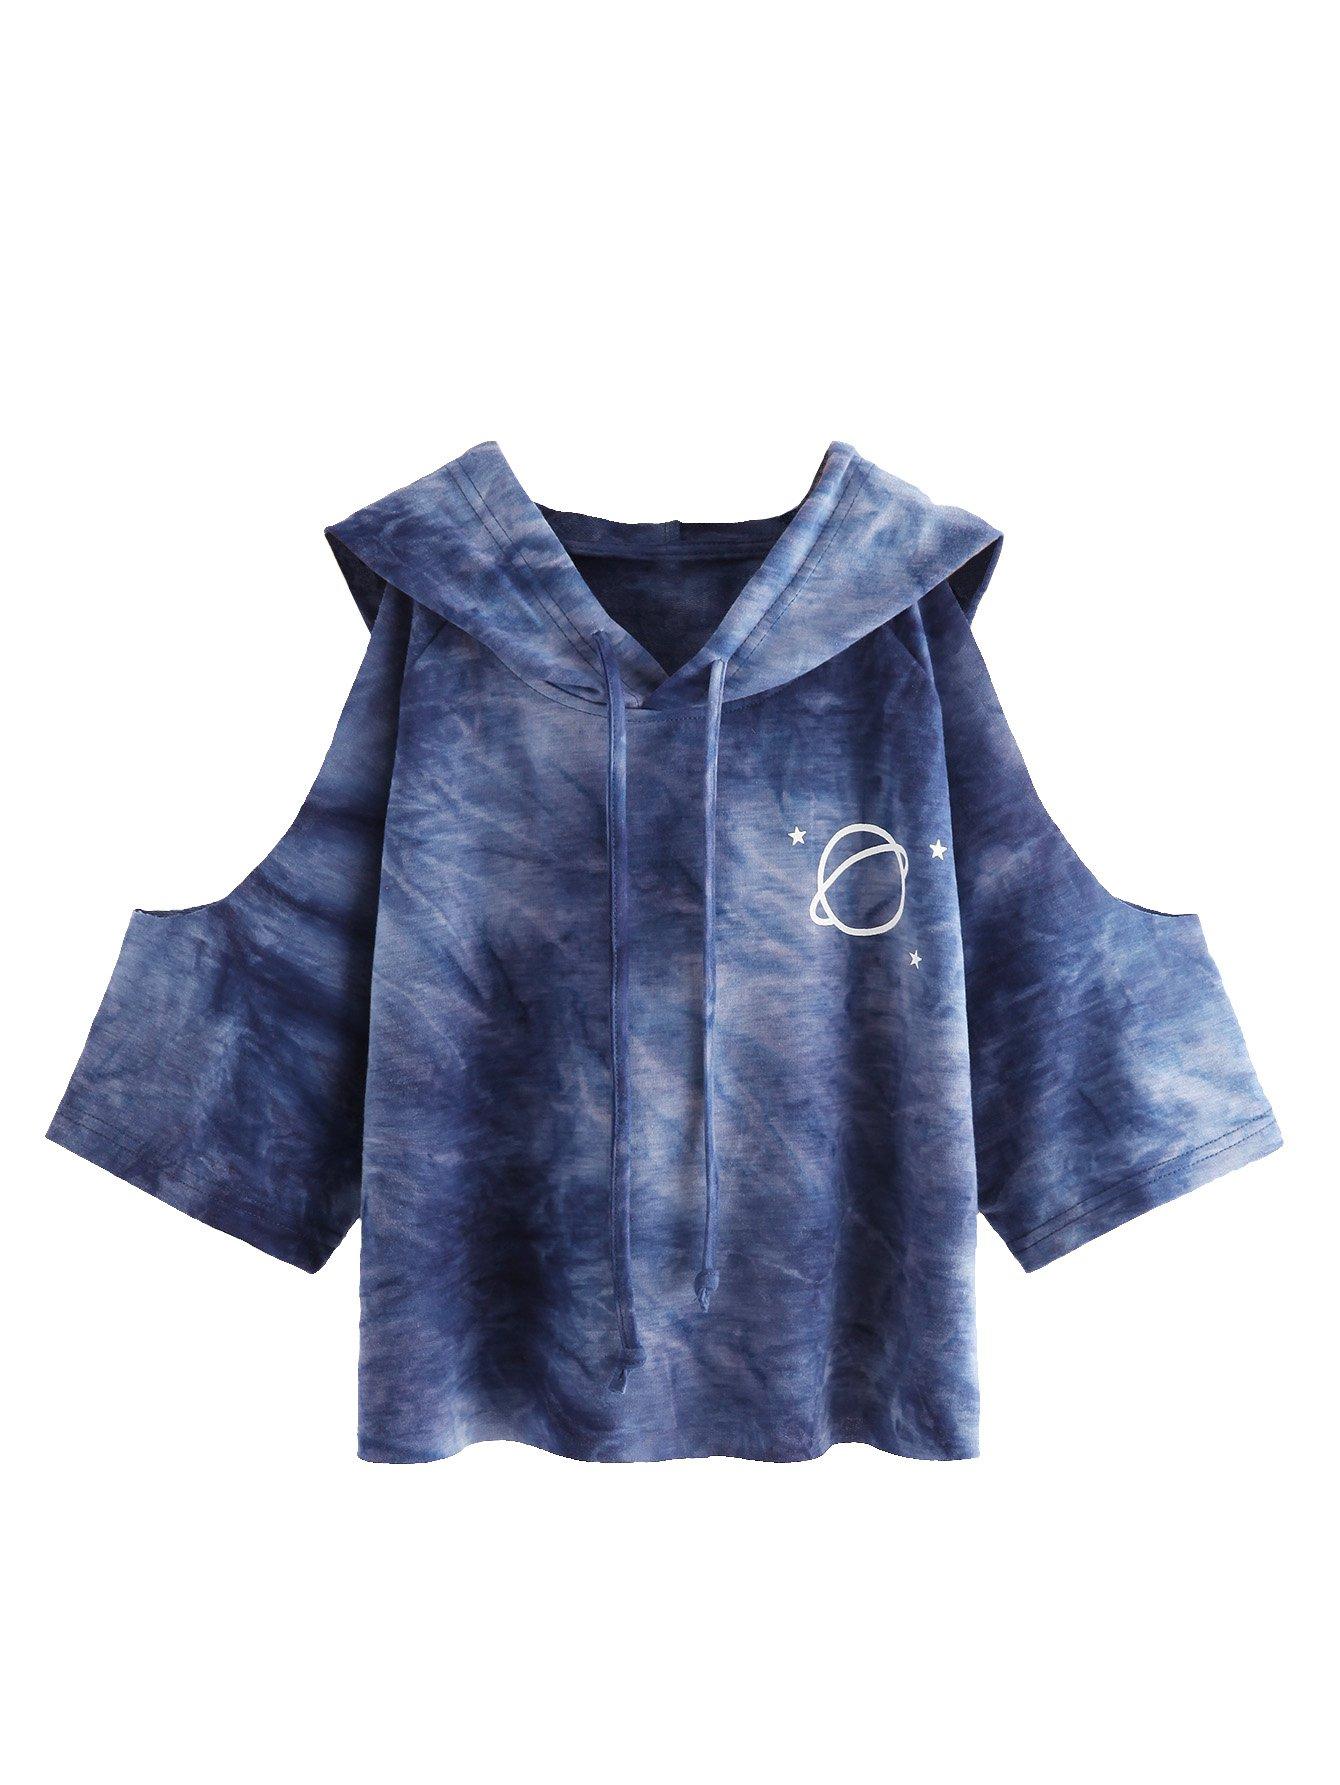 SweatyRocks Women's Cold Shoulder Tie Dye Pullover Hoodie Crop Top Sweatshirt Blue S